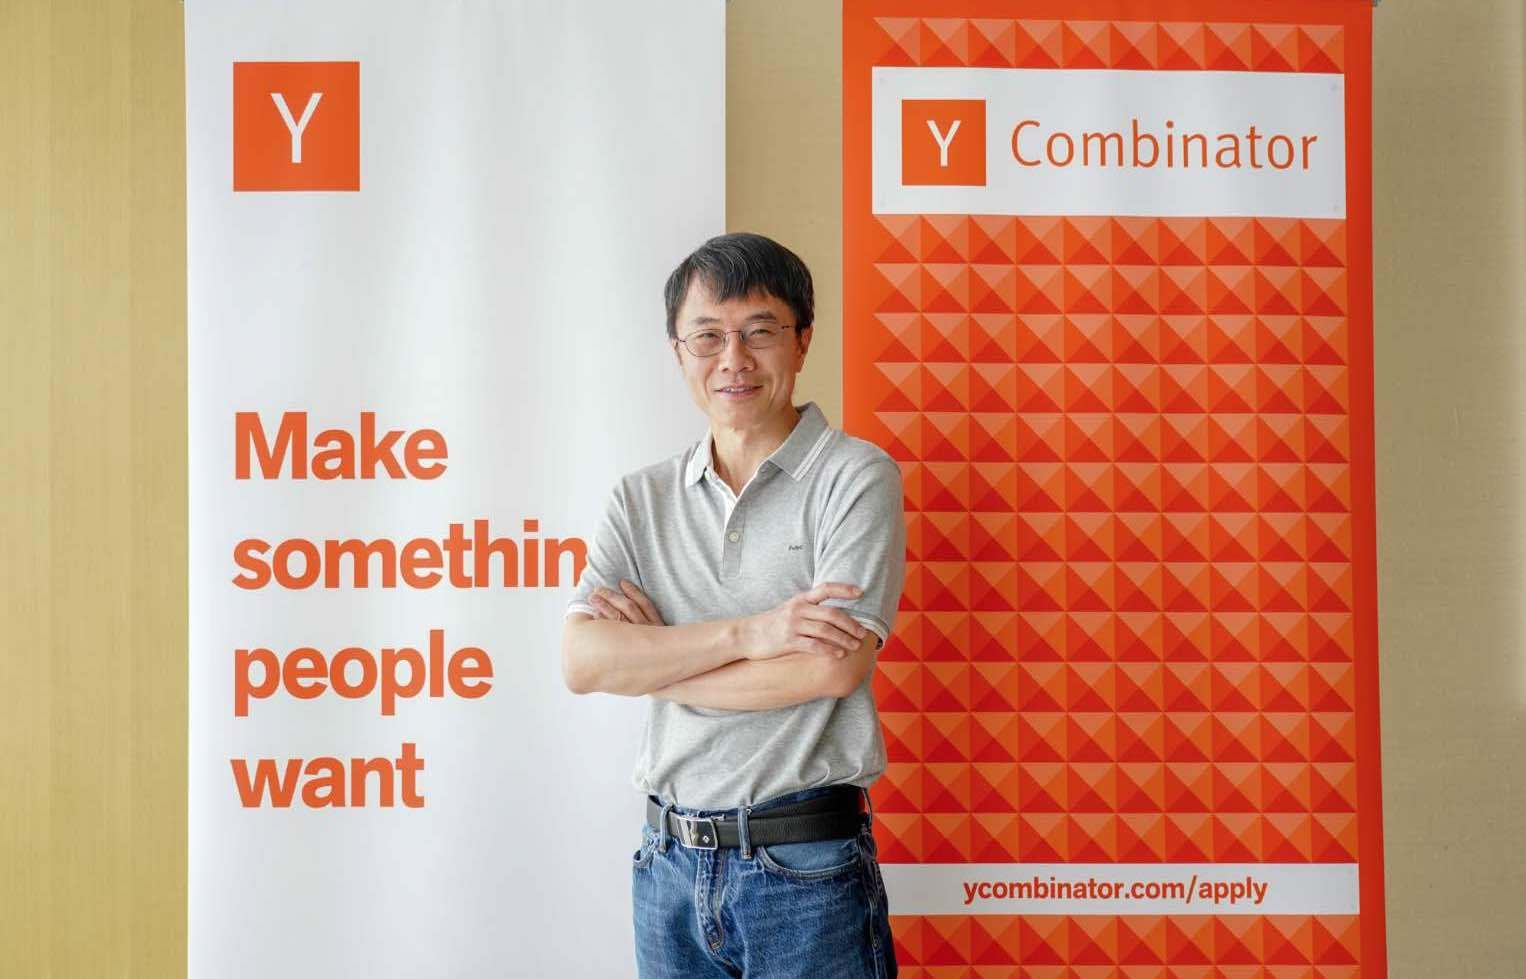 Y Combinator 中国定于 2019 下半年推出本土化项目